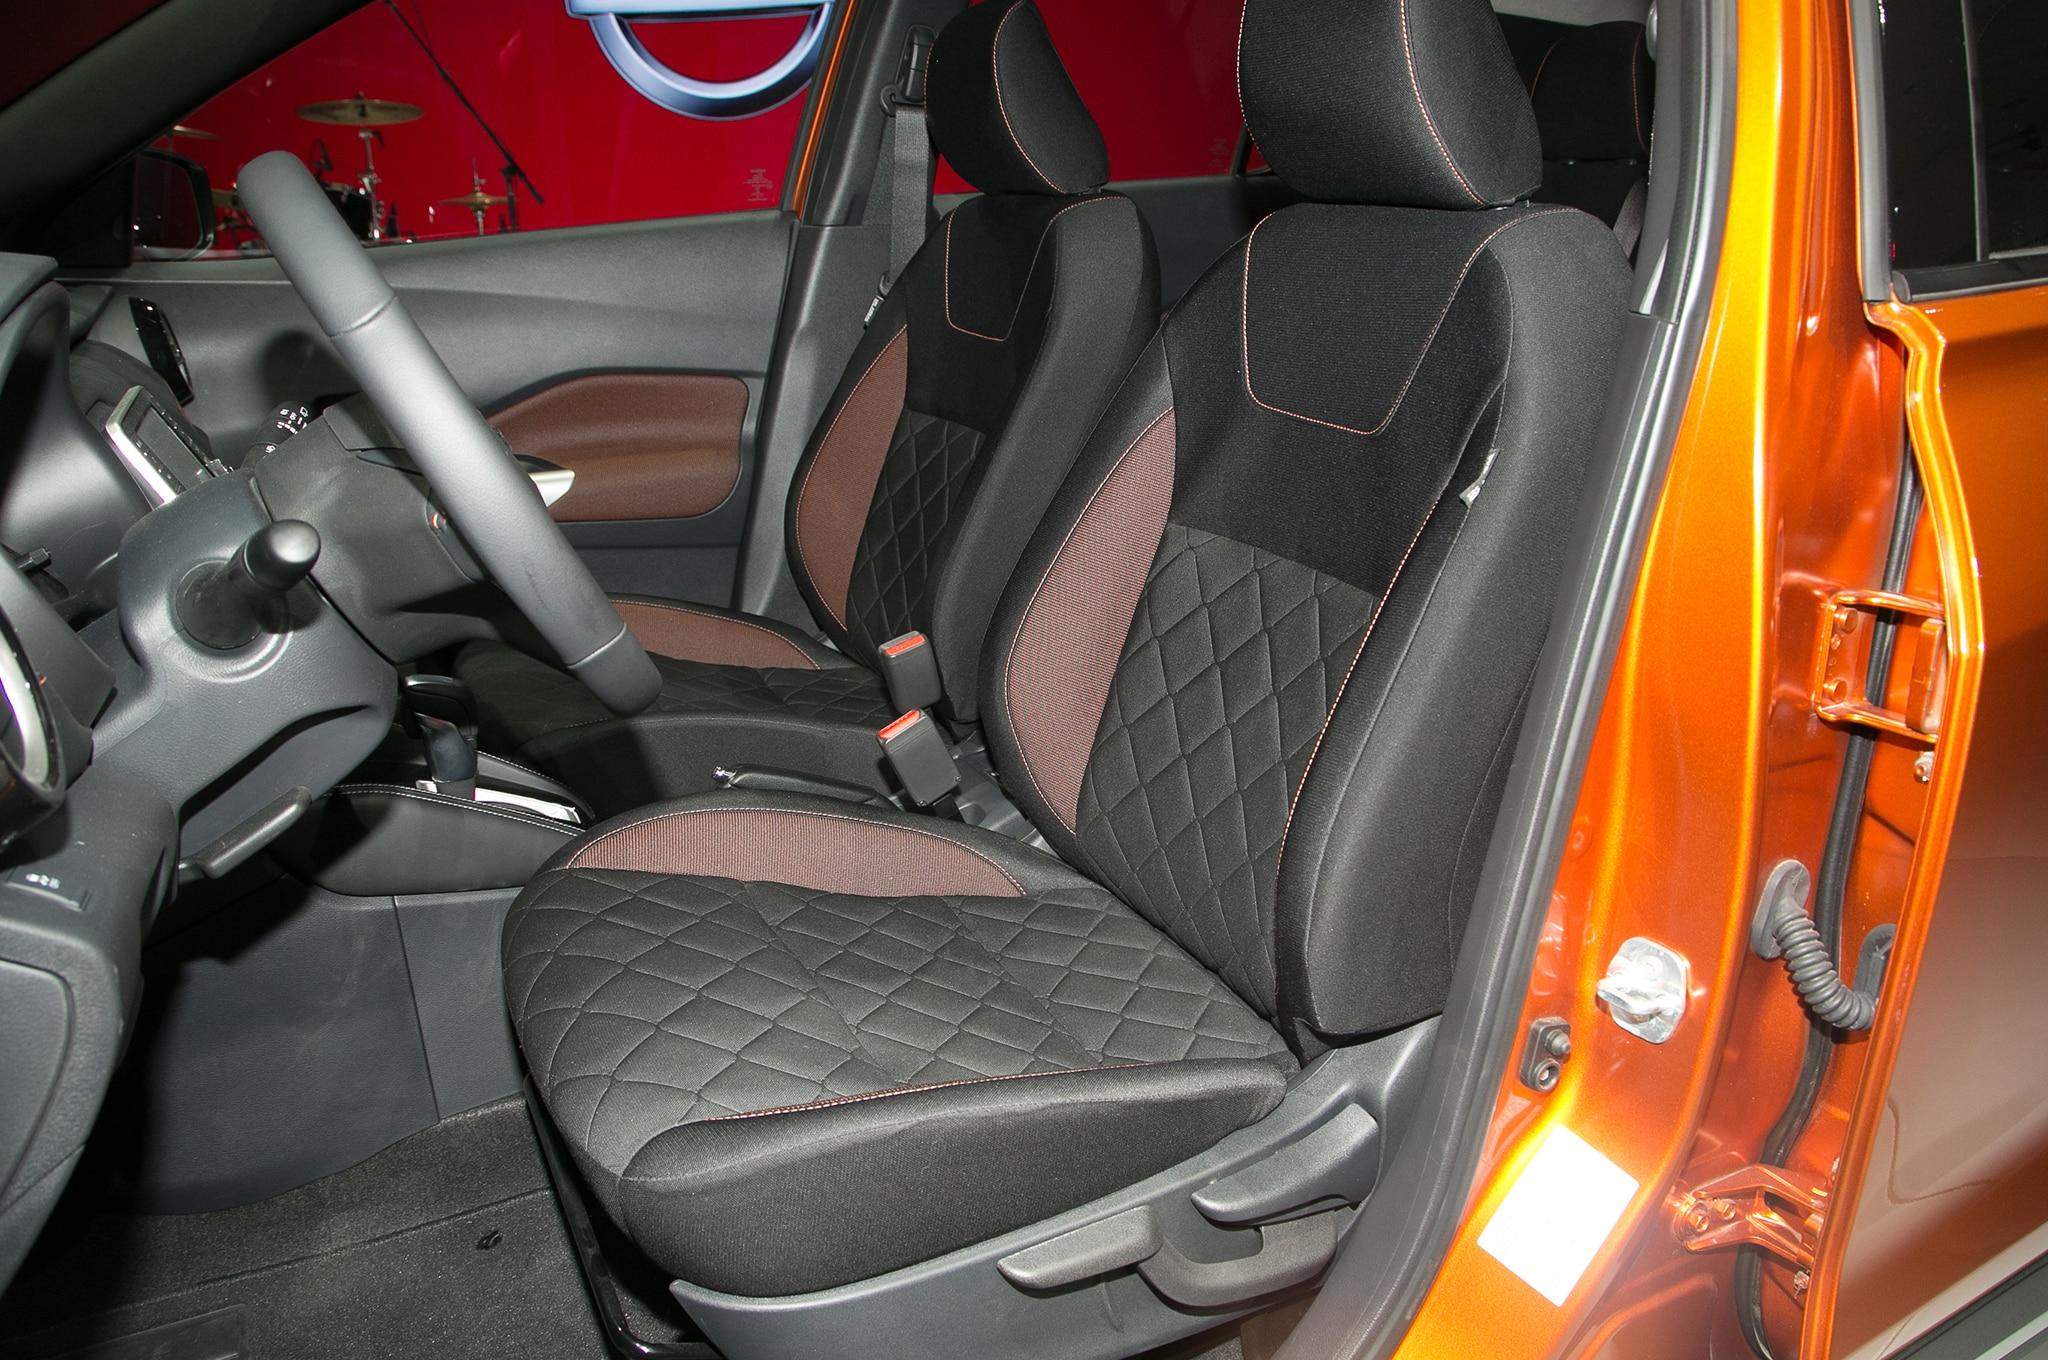 2018 Nissan Kicks Priced Below $19,000 | Automobile Magazine